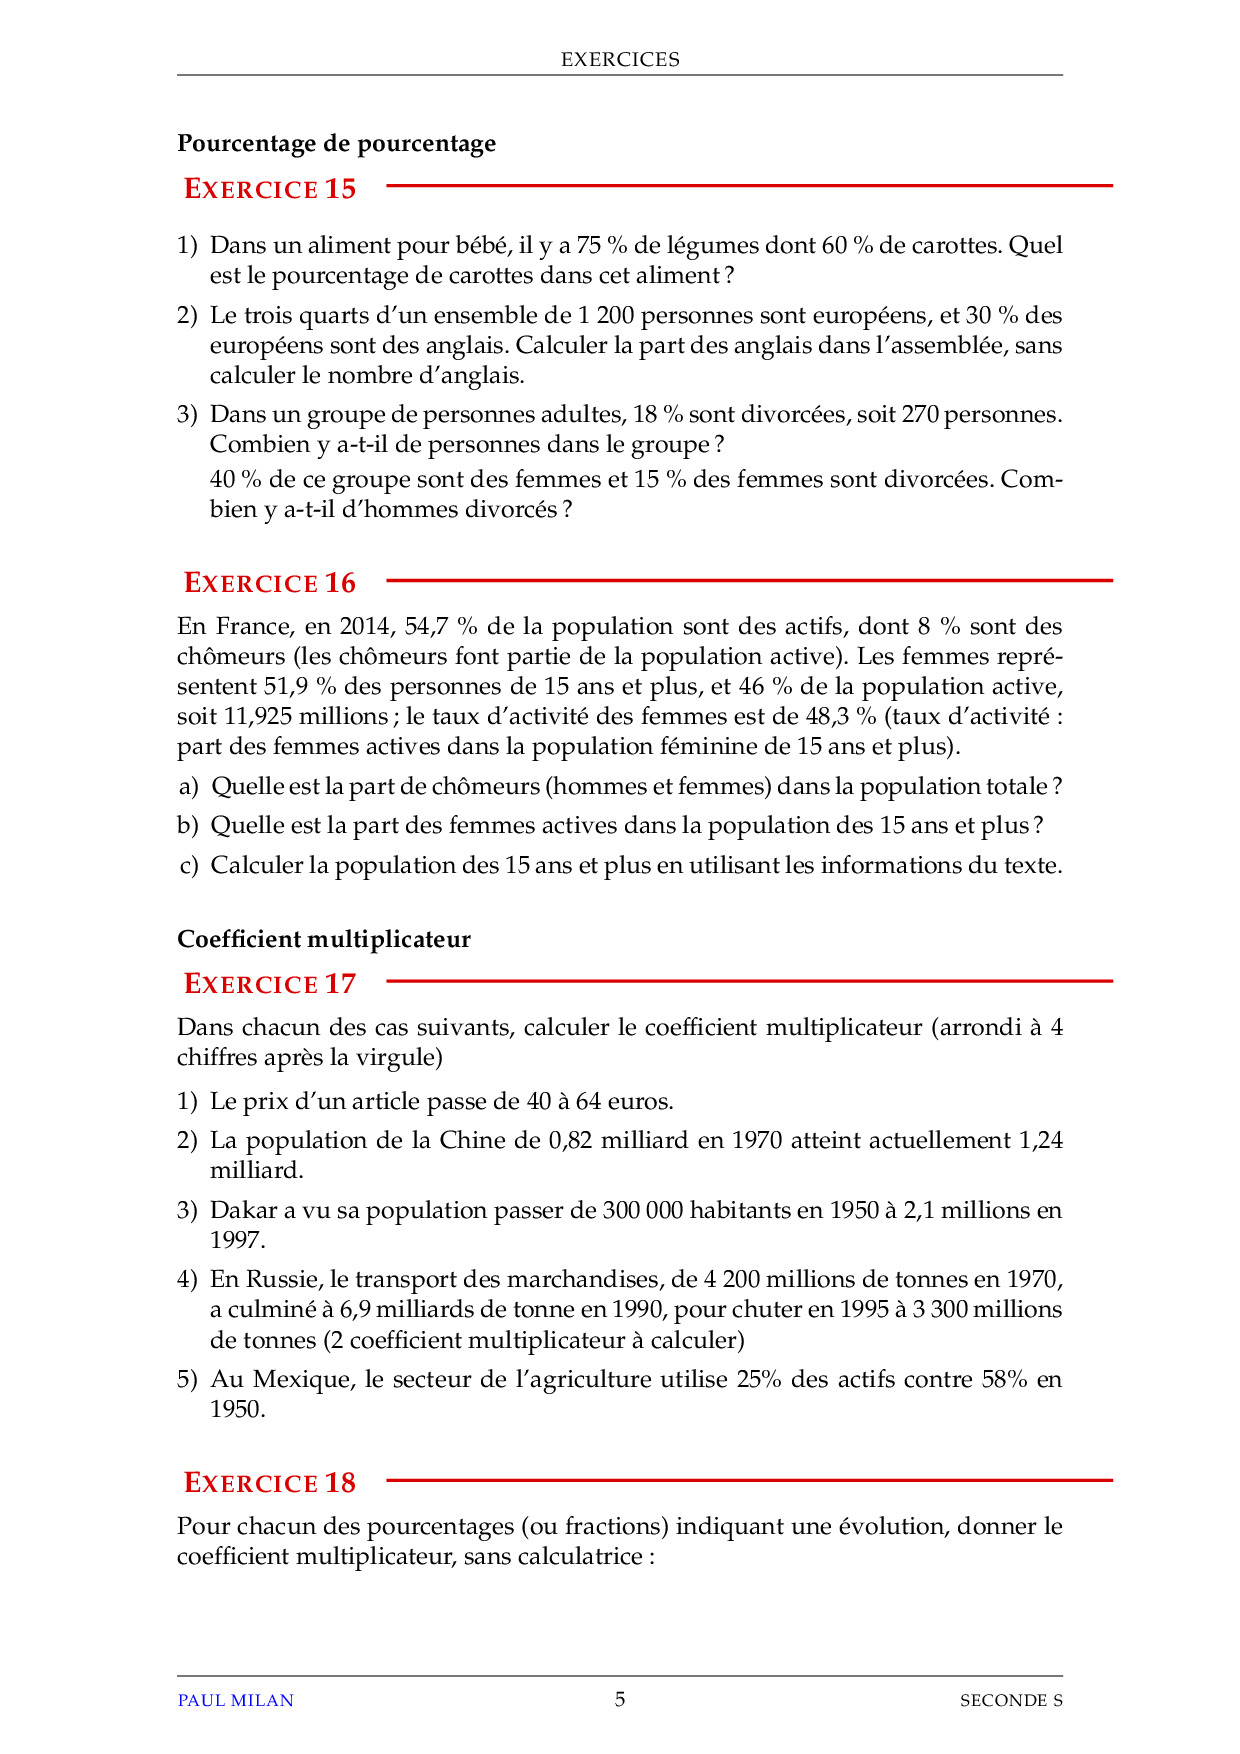 Statistiques - Probabilités - Exercices non corrigés - AlloSchool